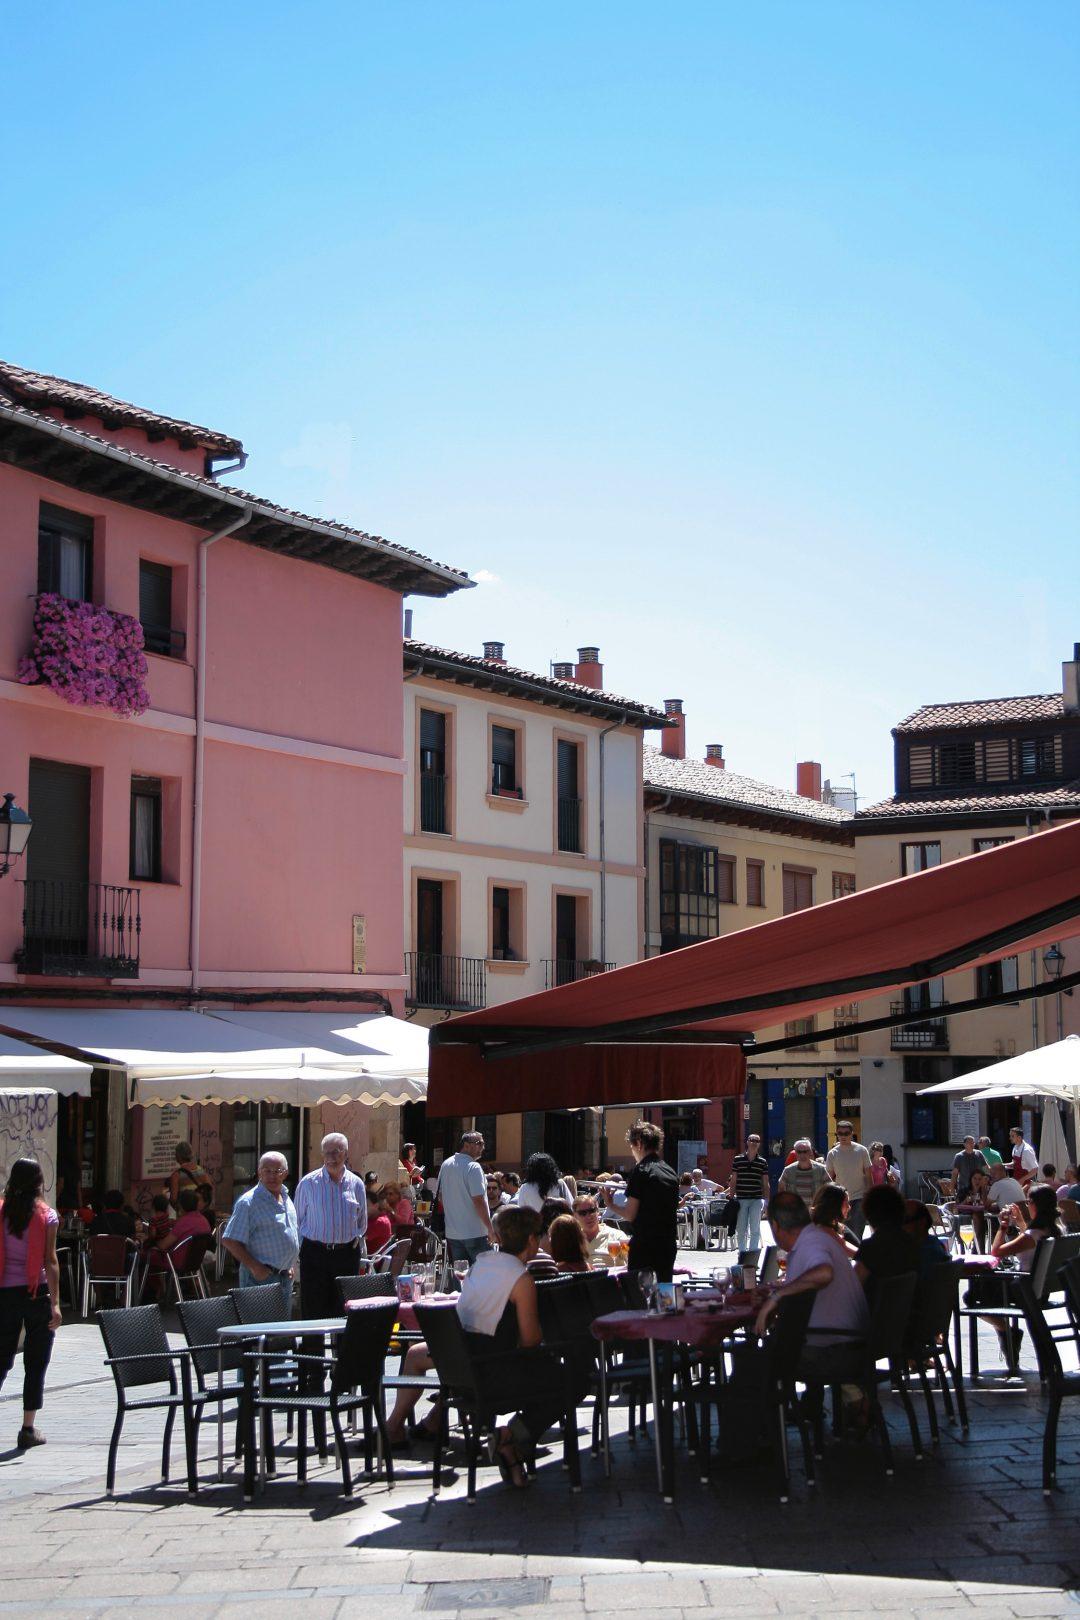 León, capitale della gastronomia spagnola